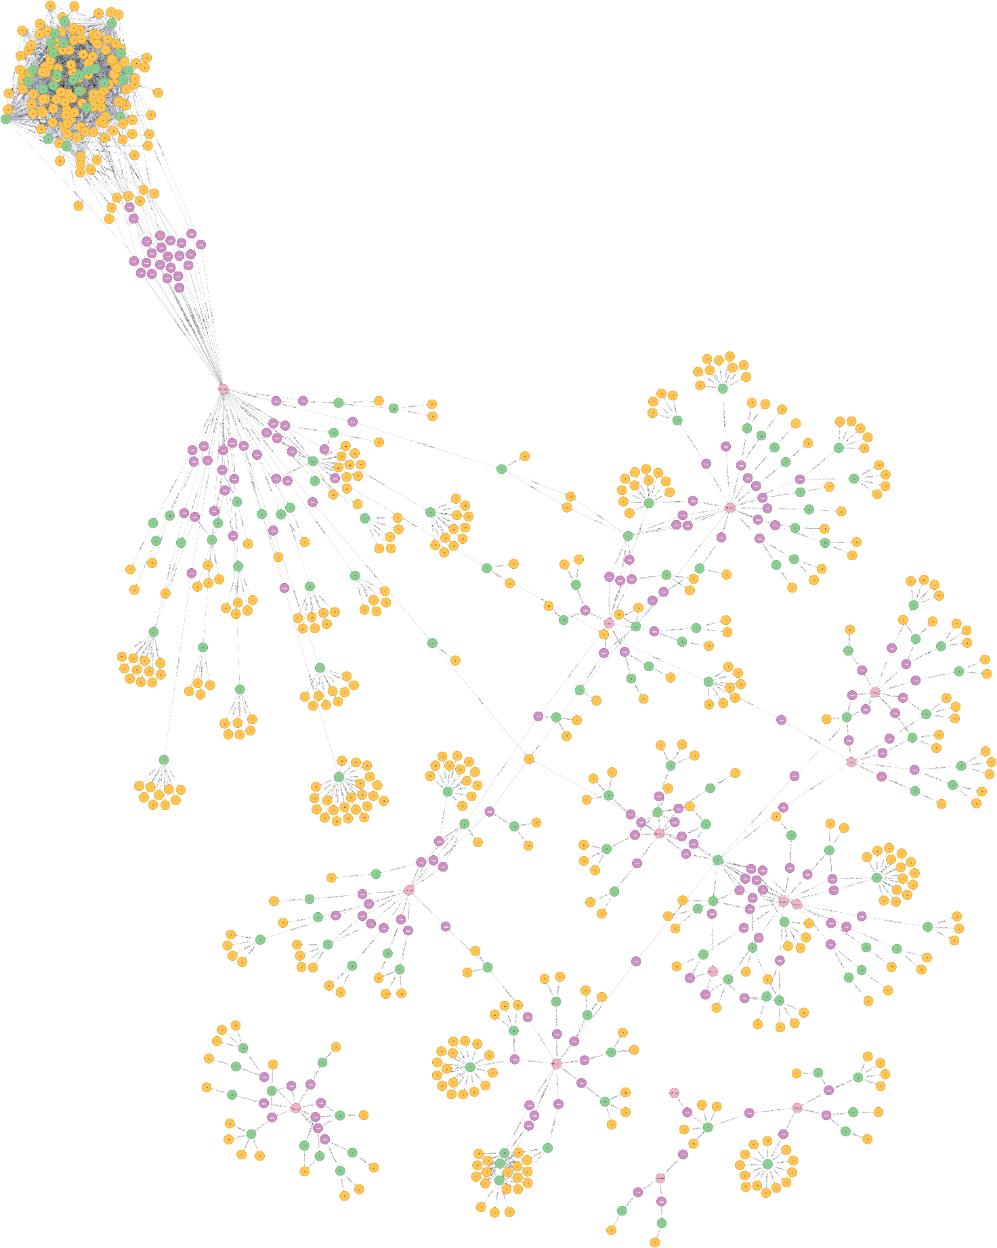 Taxonomy3 graphic